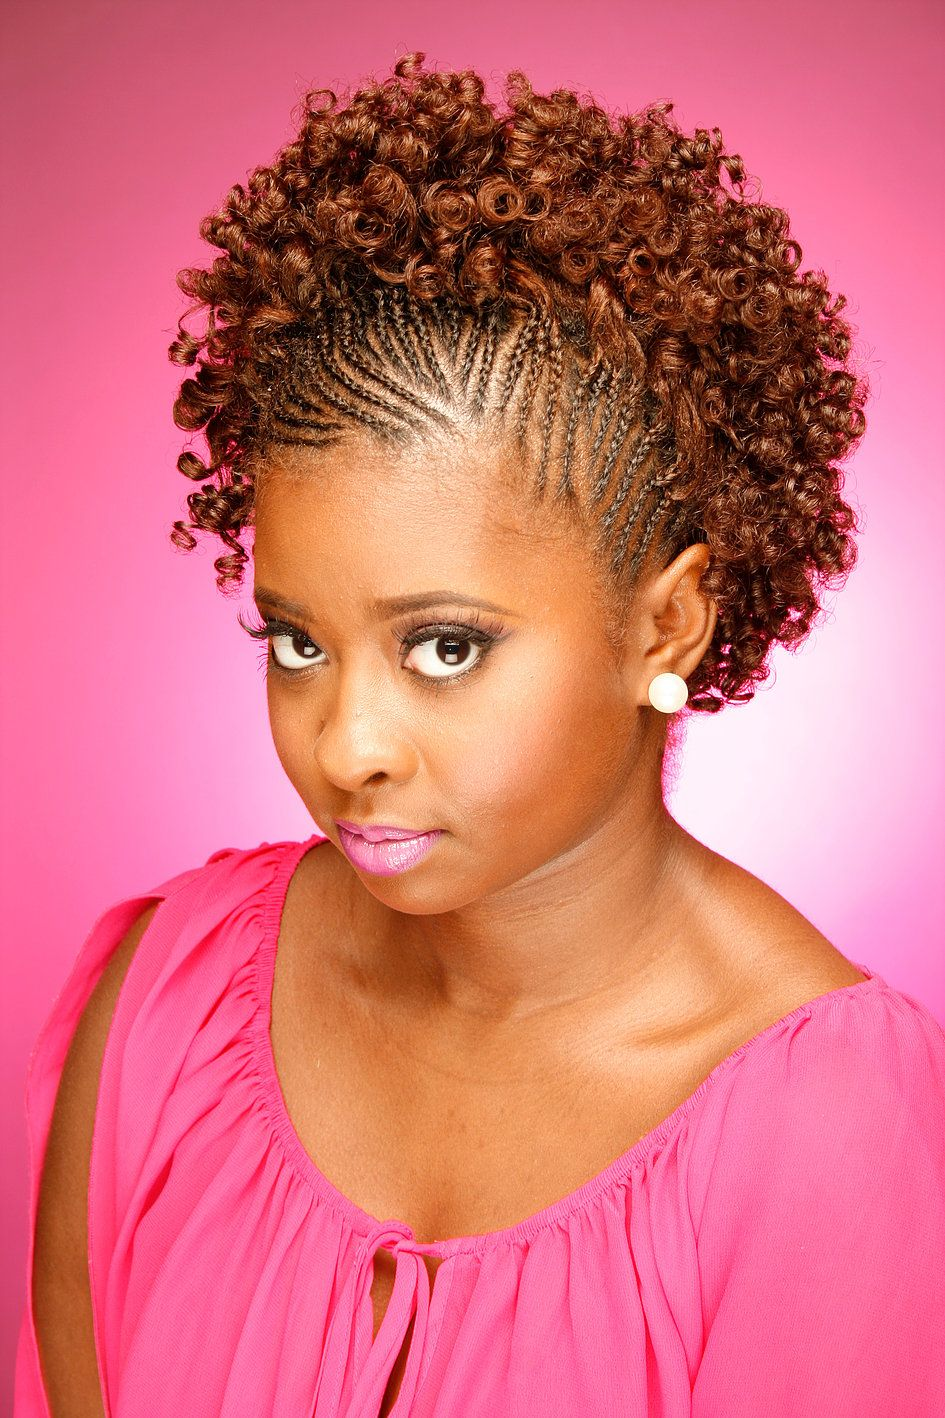 Natural Hair Stylist In Atlanta Curly Hair Natural Hair Salons Natural Hair Stylists Curly Hair Styles